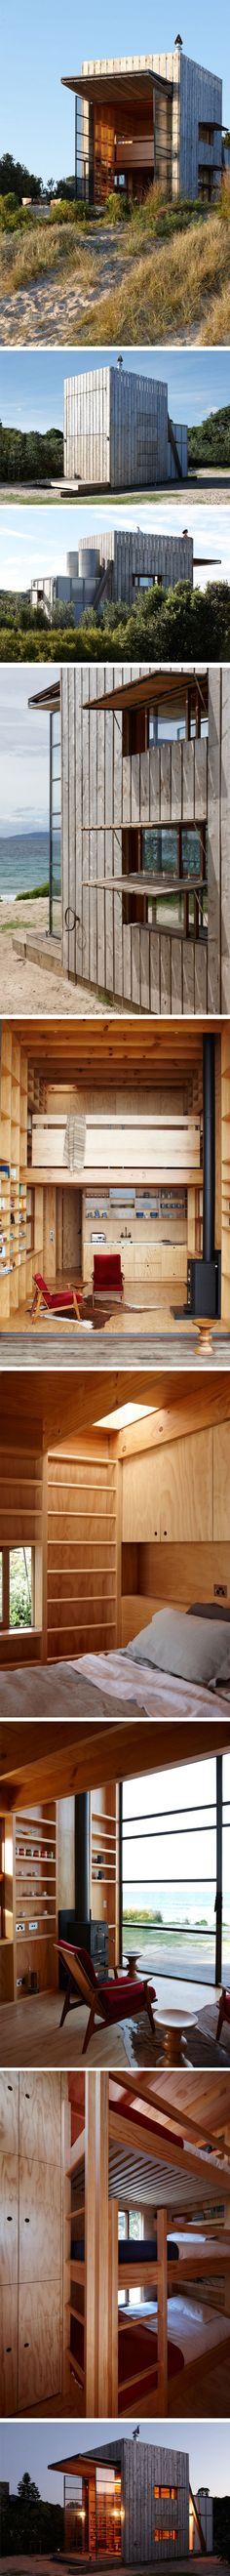 Whangapoua-Sled-House-Crosson-Clarke-Carnachan-Architects-2